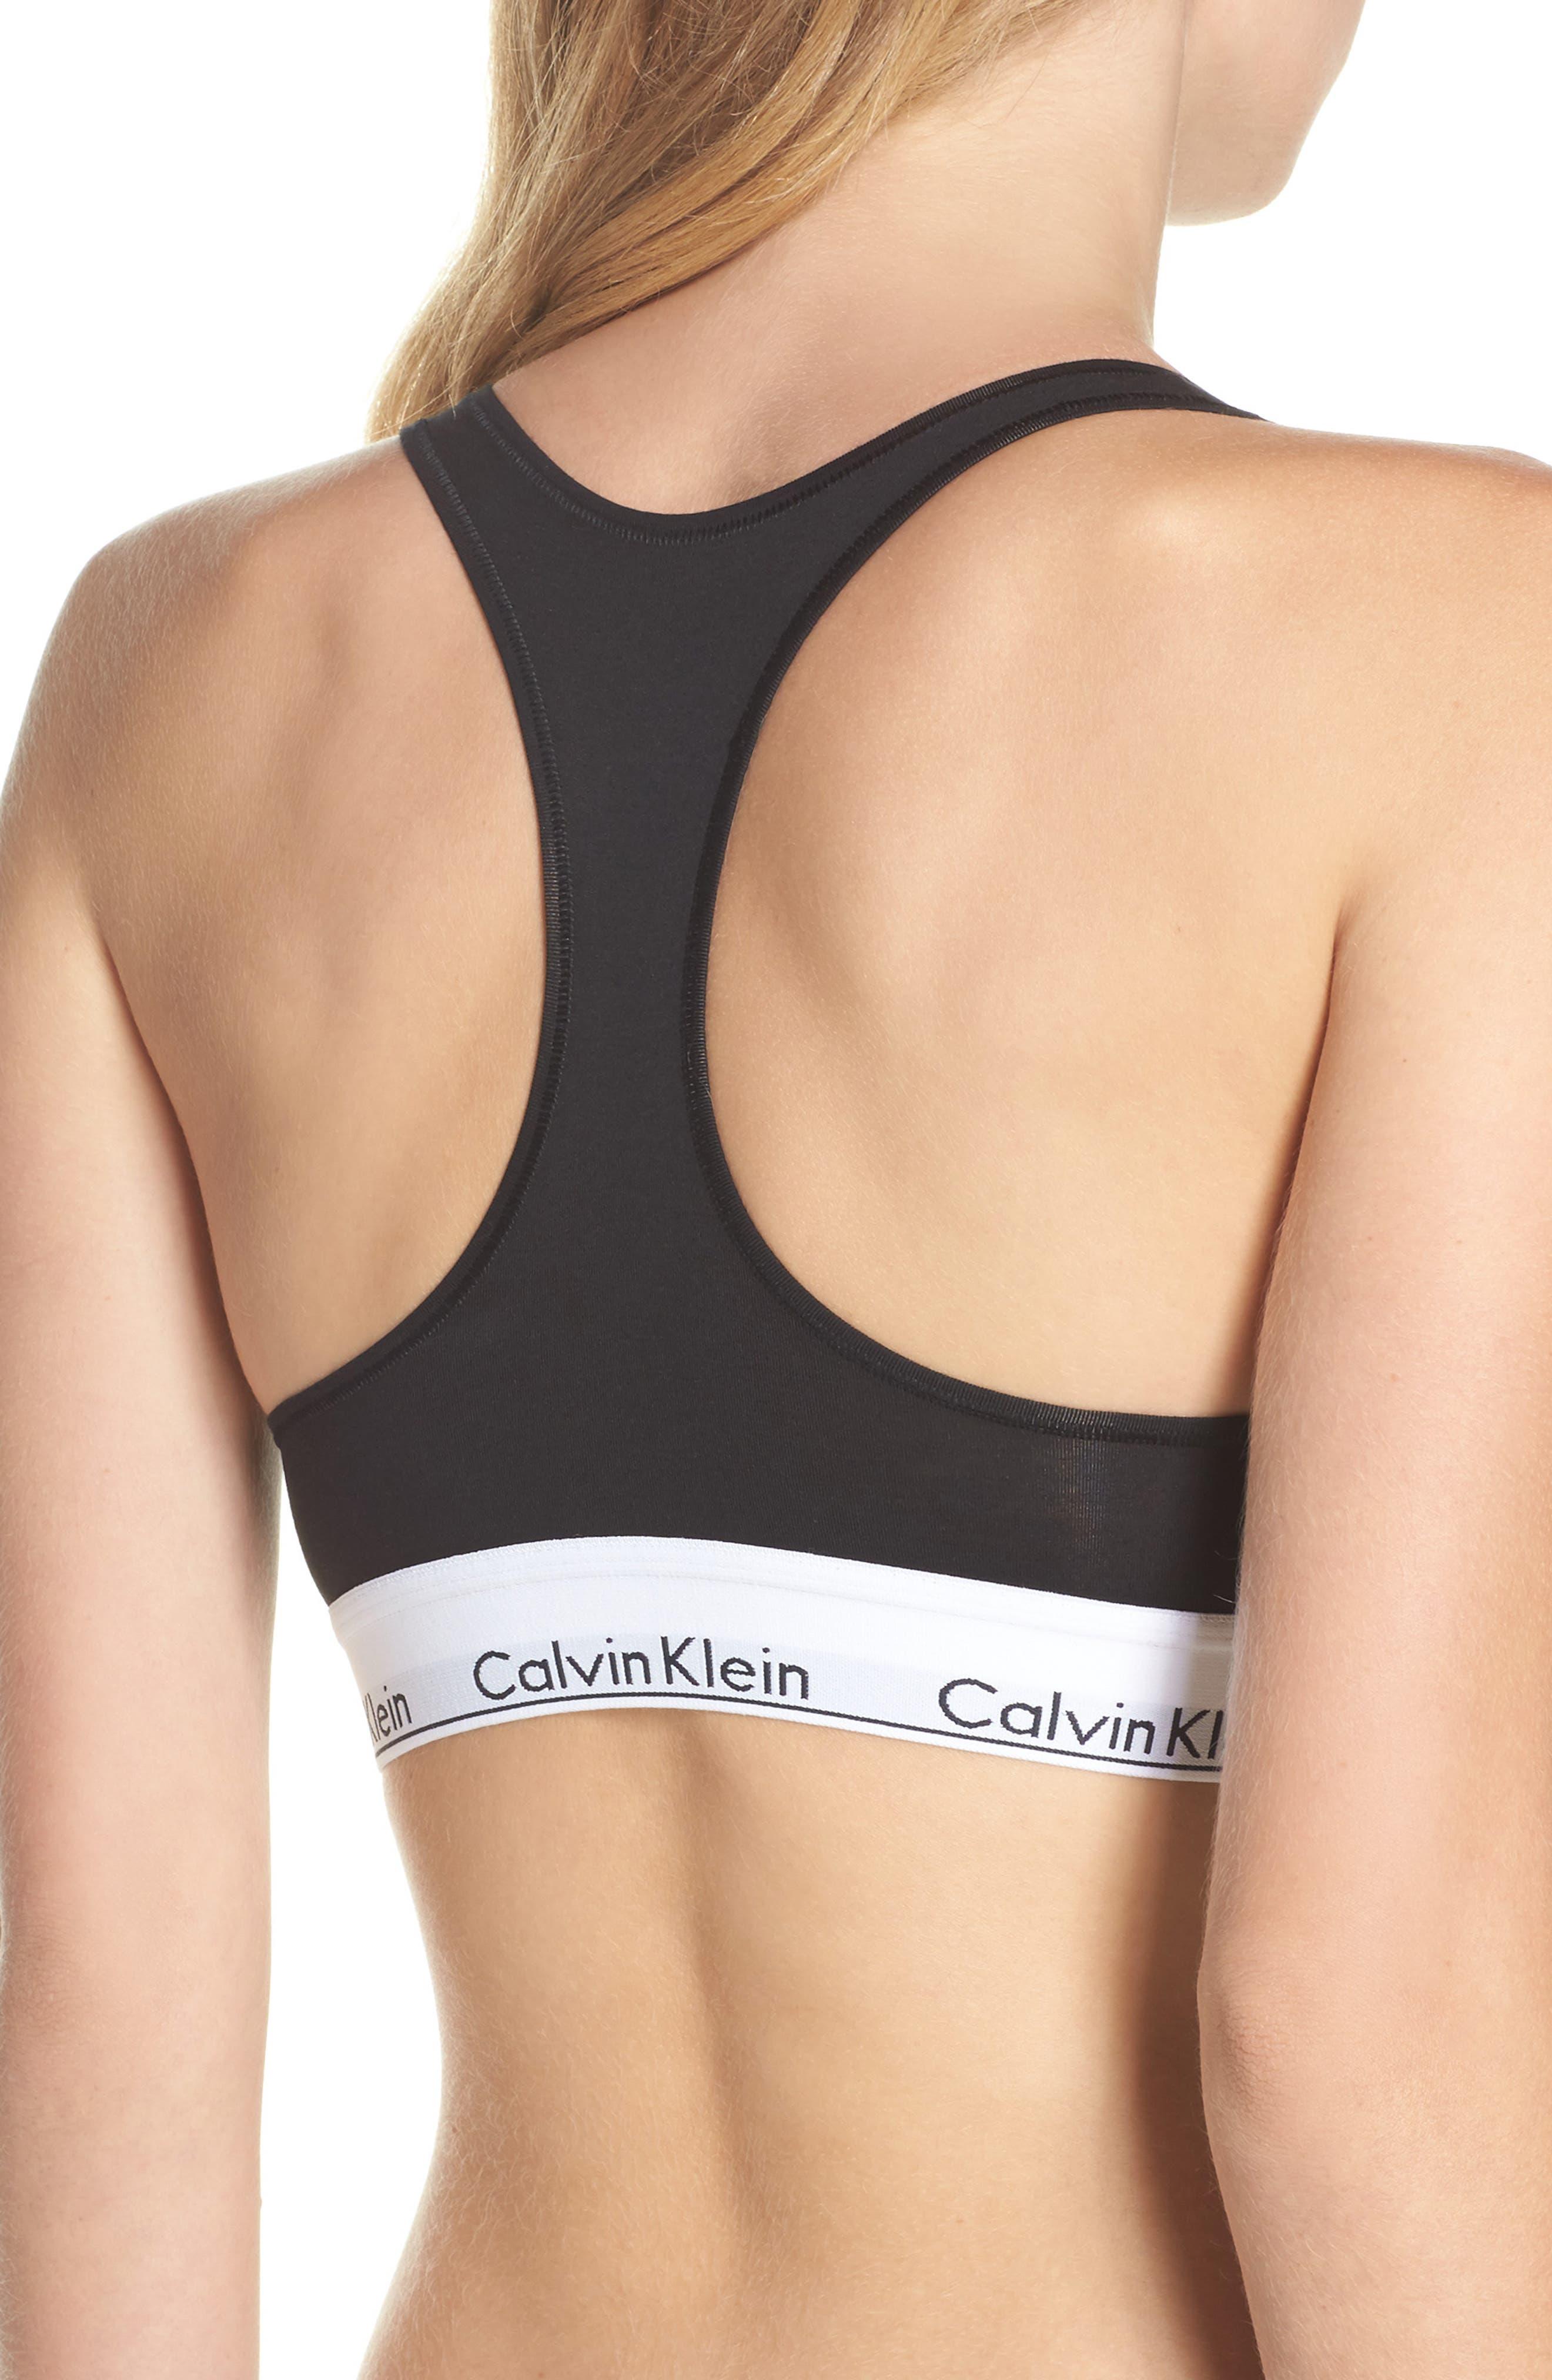 e834b601dce98 Calvin Klein Women s Lingerie  Bras   Panties